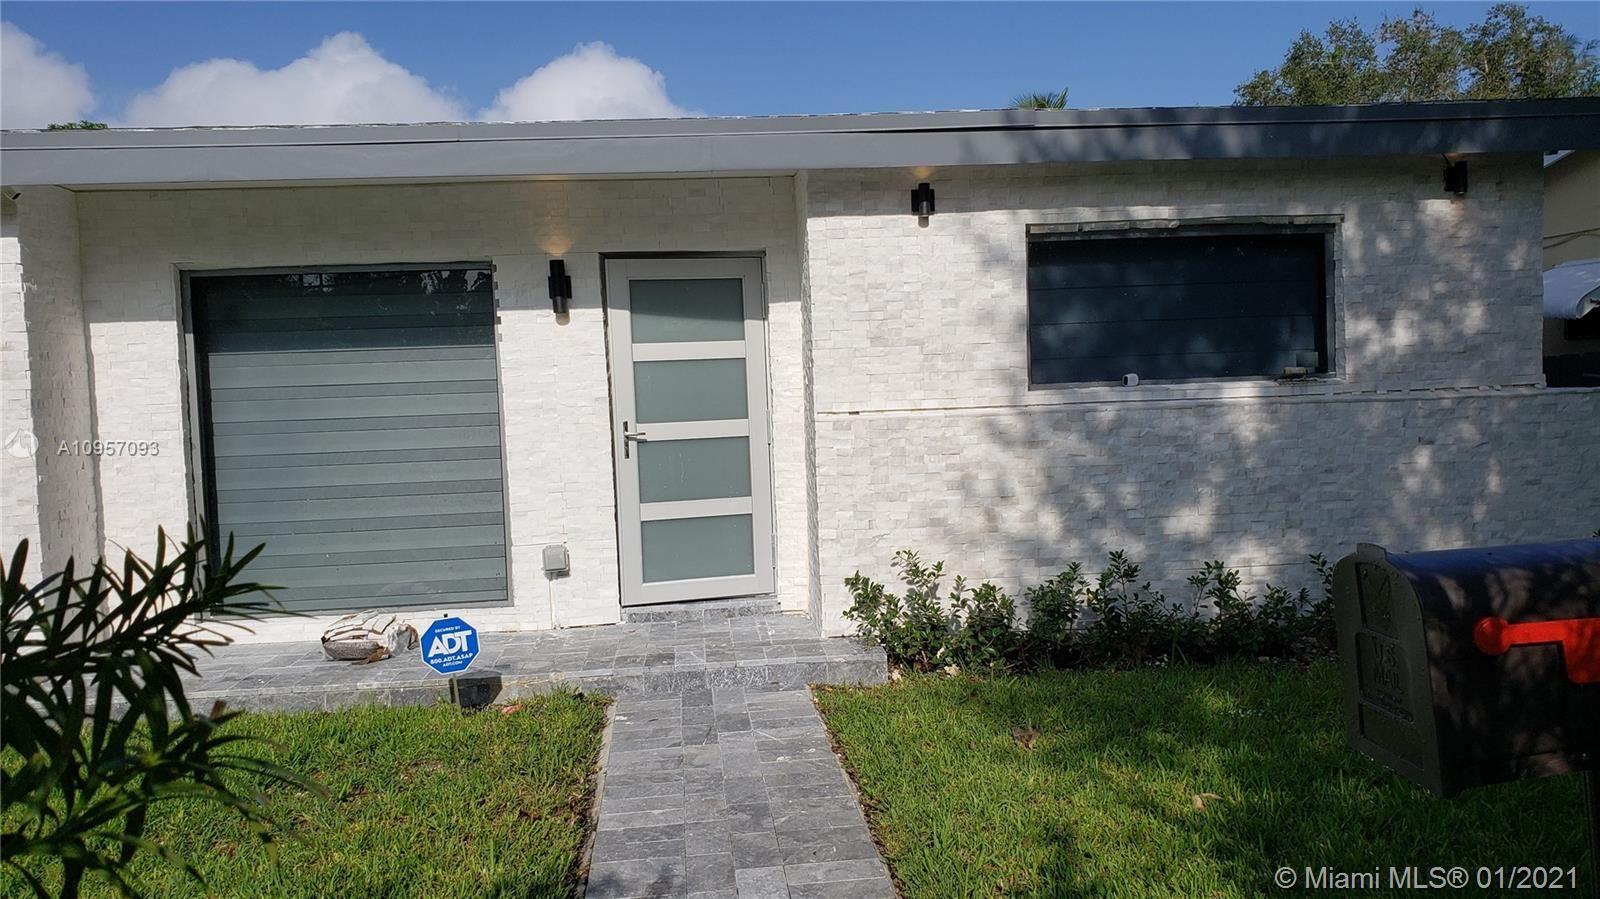 8430 E Dixie Hwy, Miami, FL 33138 - #: A10957093